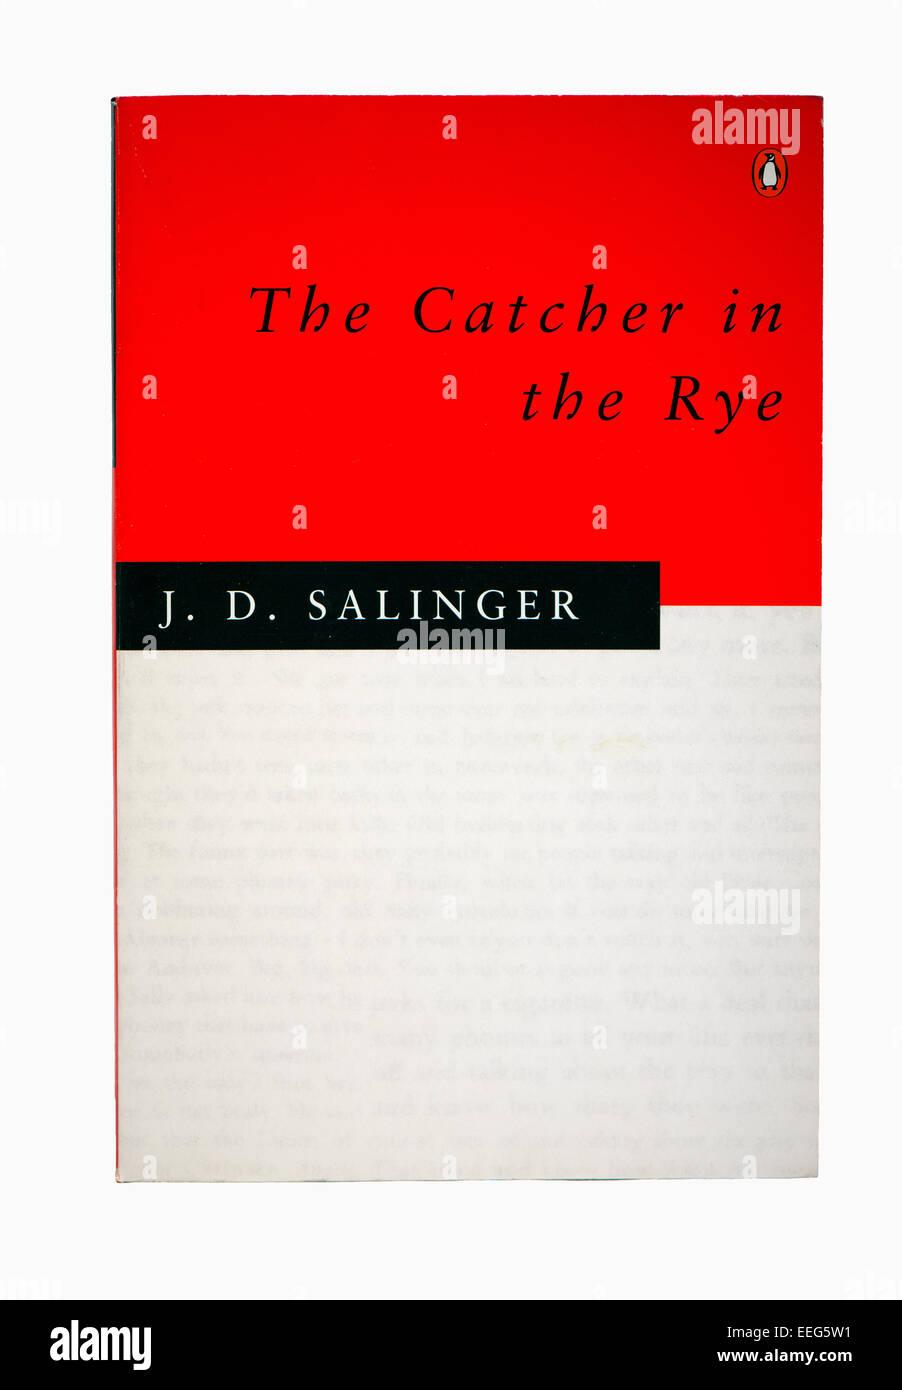 Penguin Book Cover Vector : J d salinger the catcher in rye penguin classic book